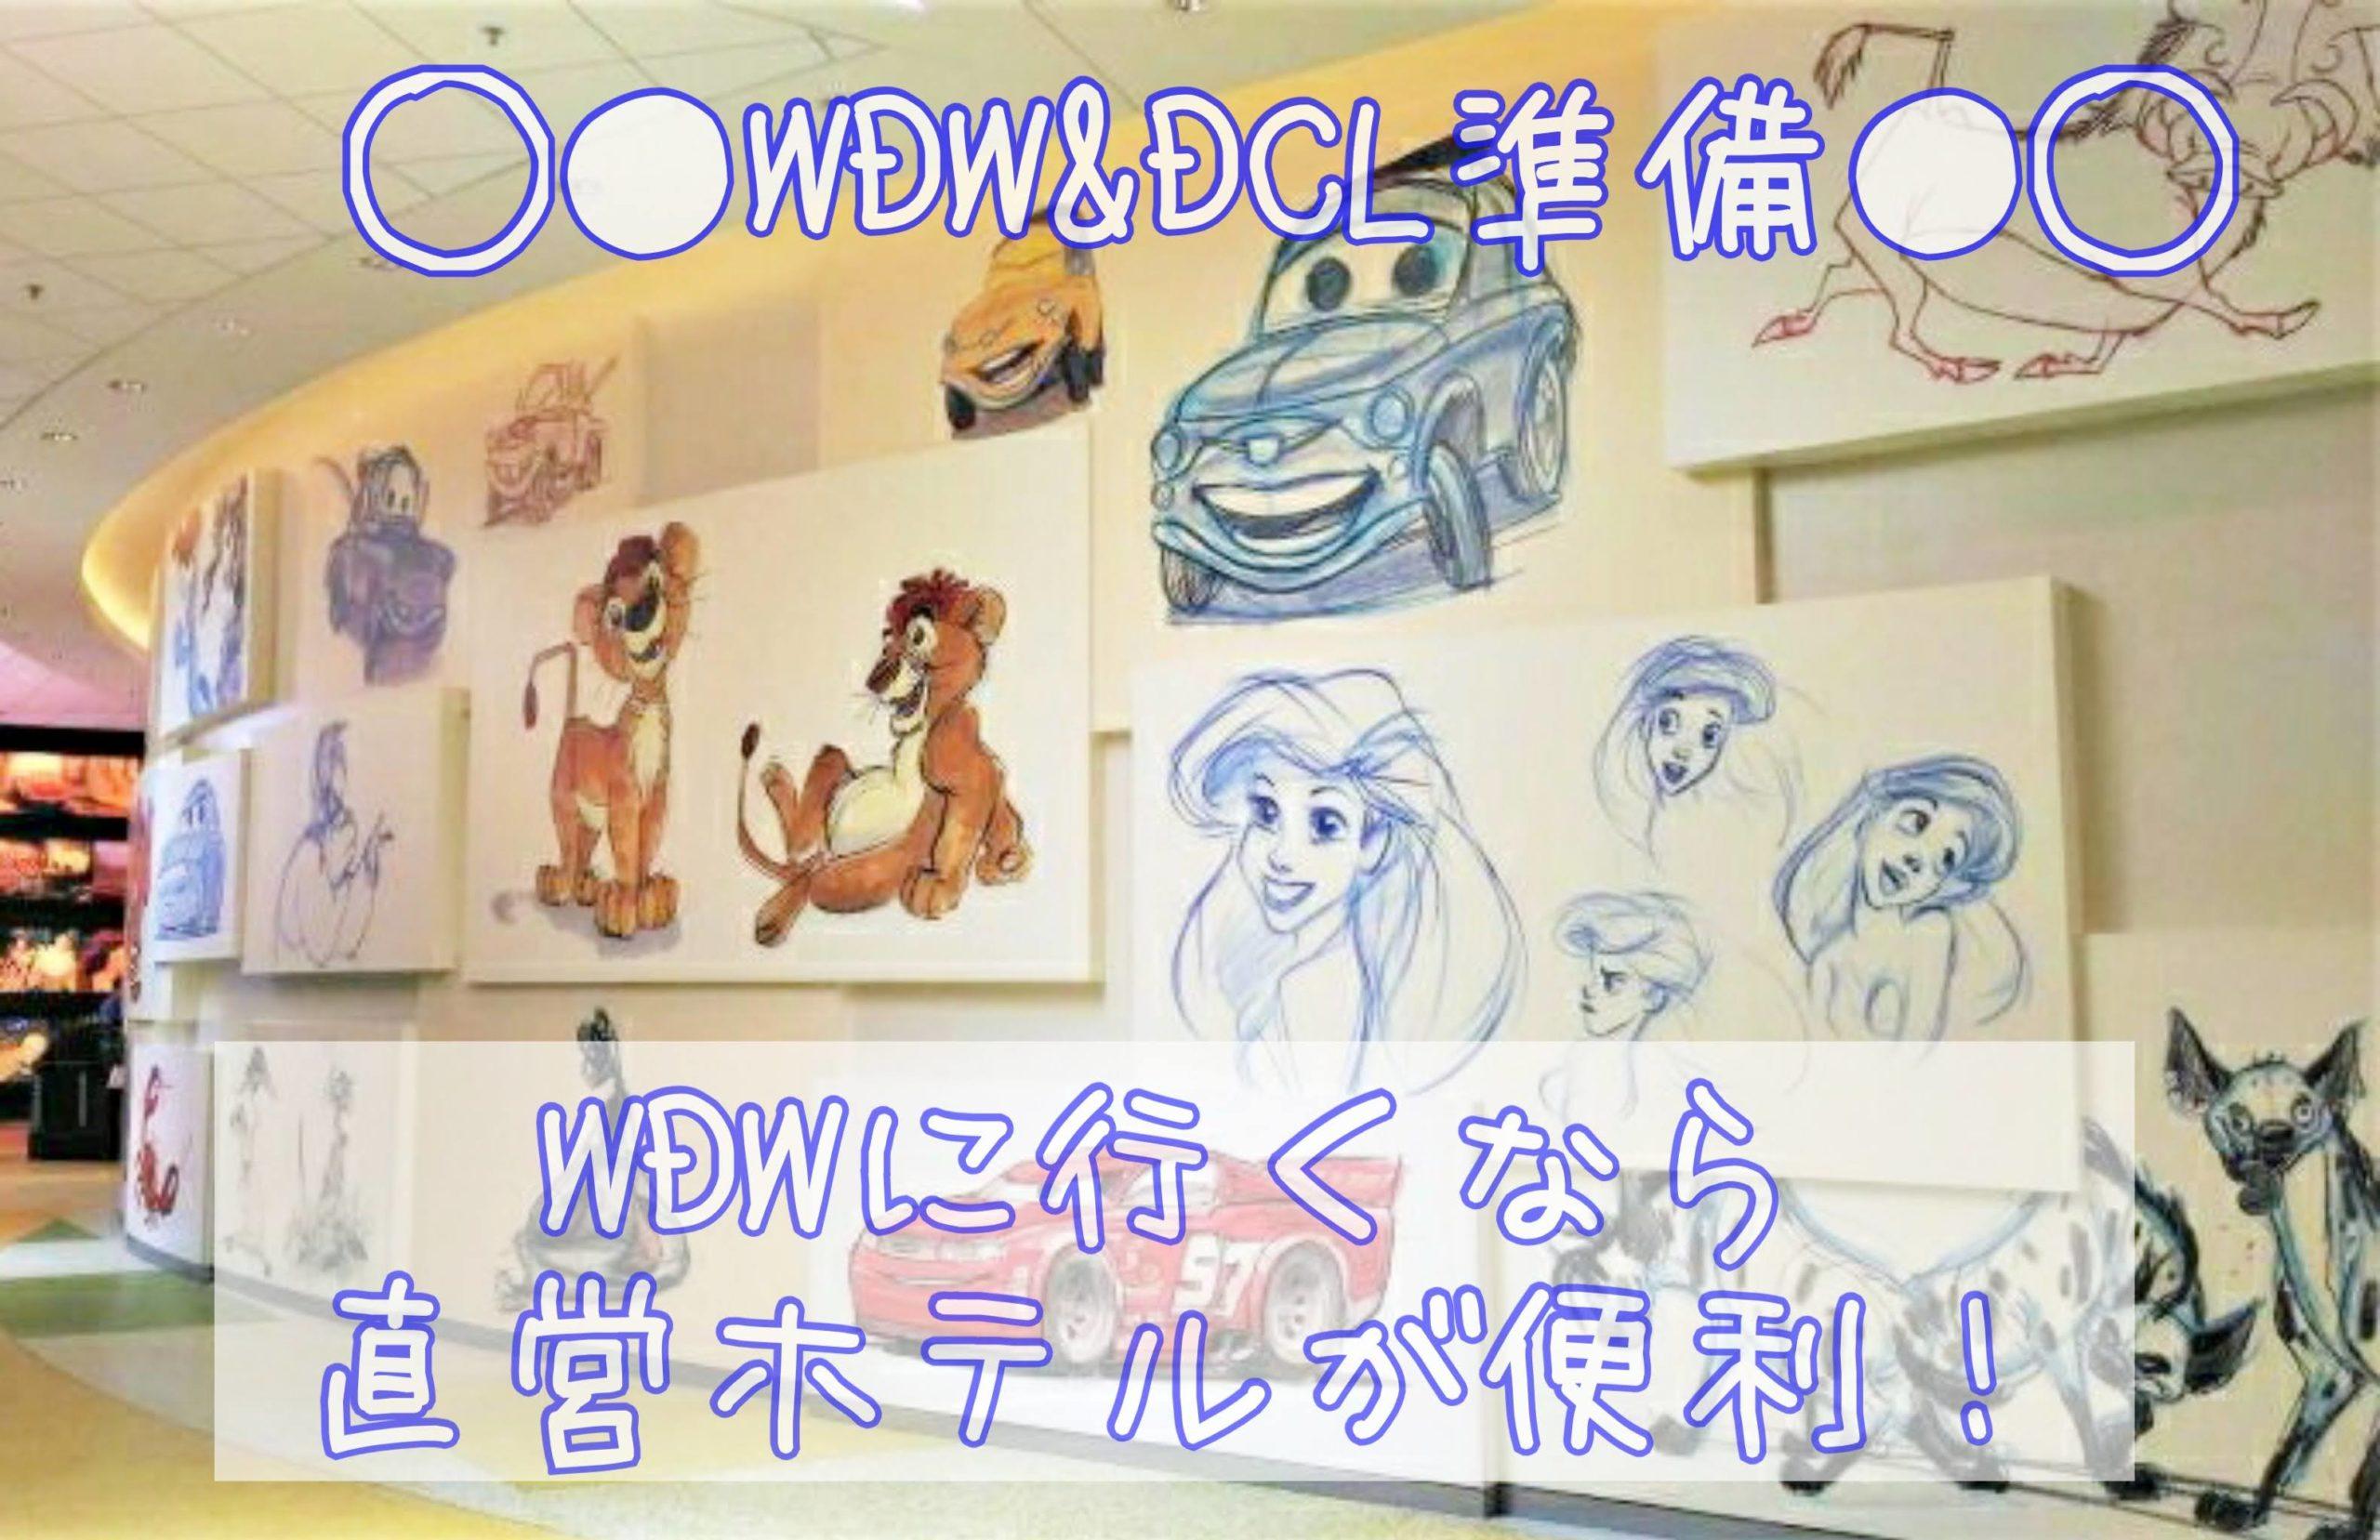 WDWに行くなら直営ホテルが便利 直営ホテルの13の特典内容を紹介